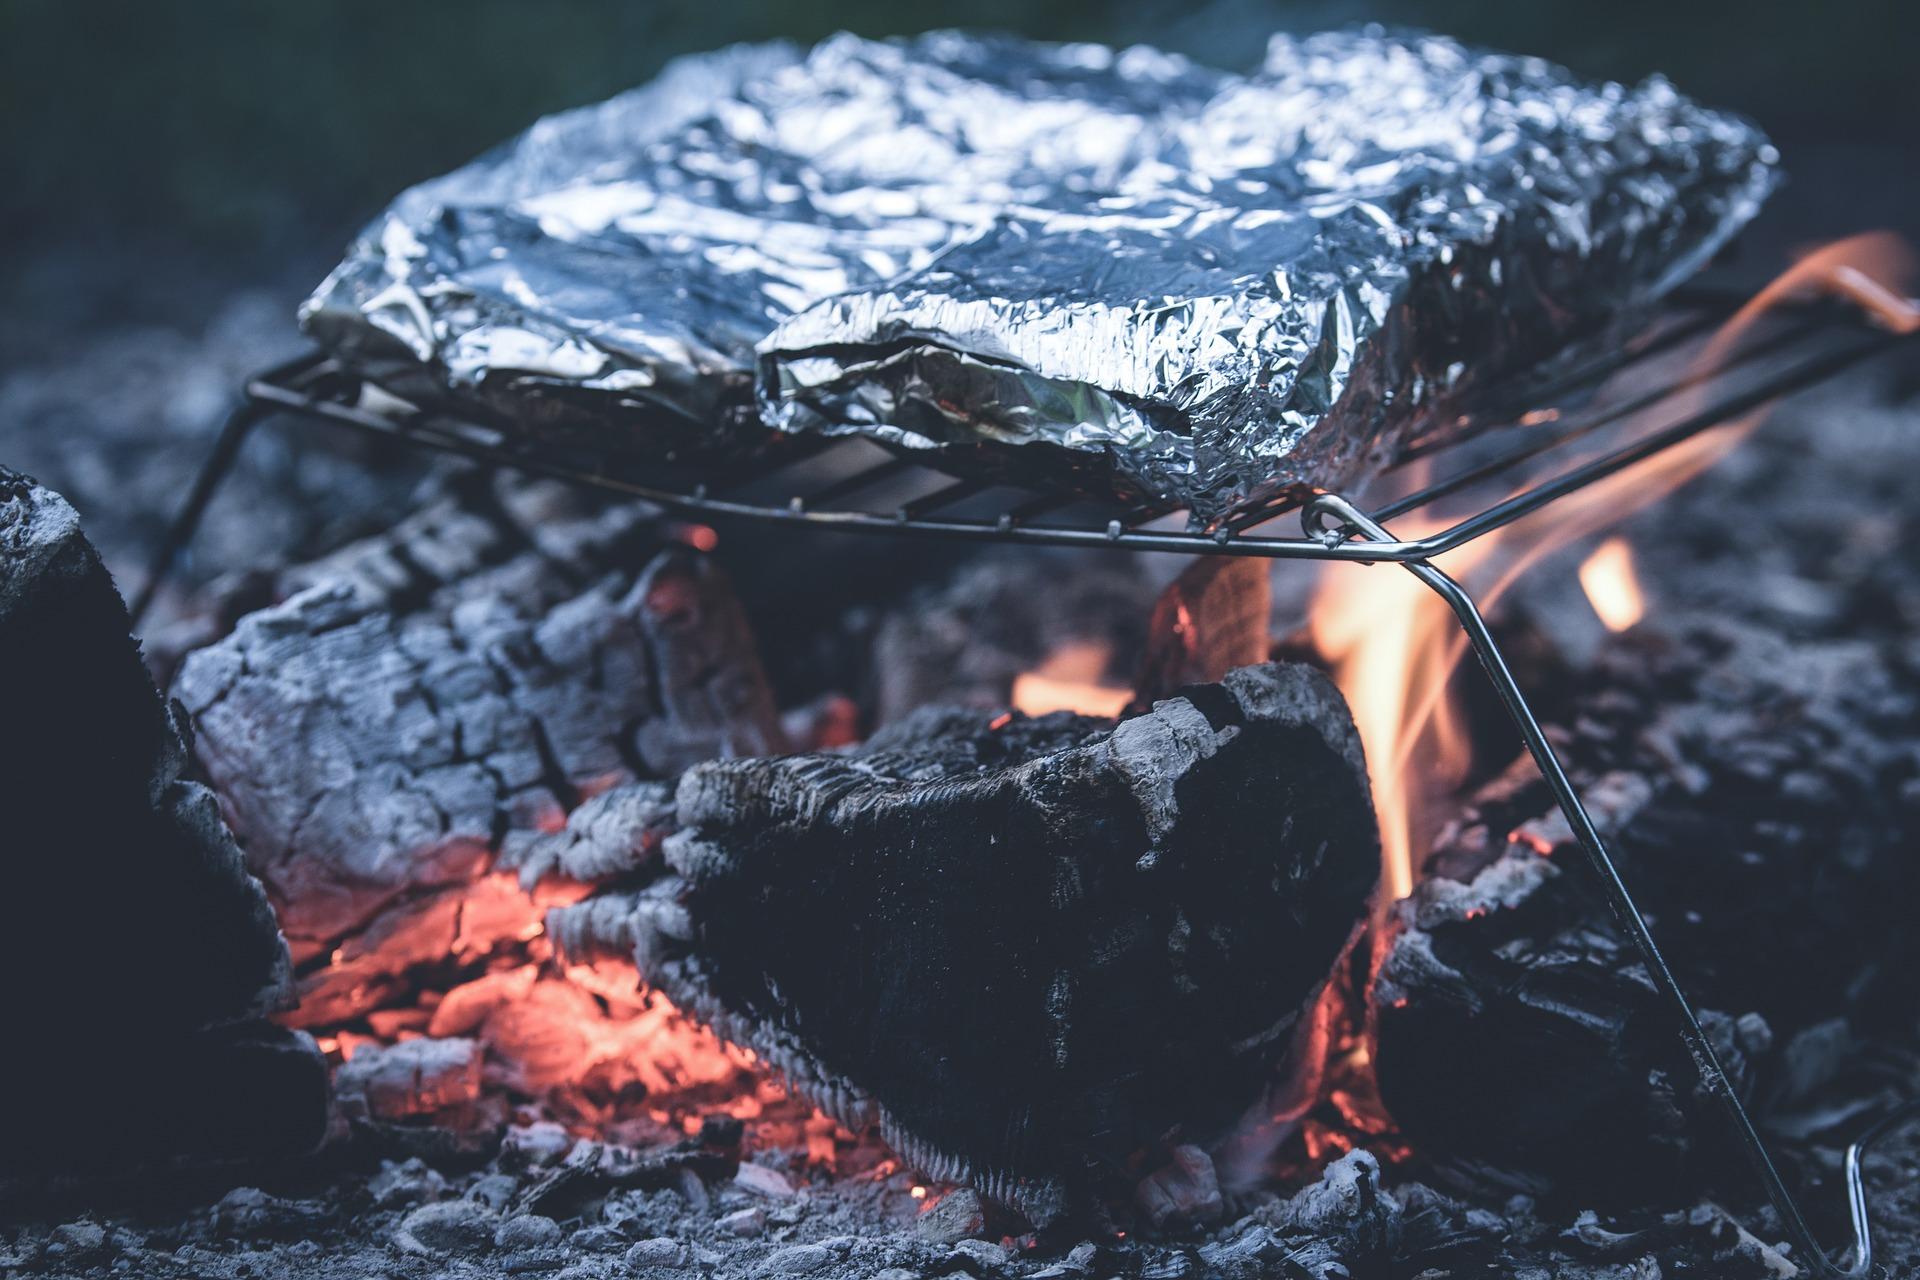 grill-1853674_1920.jpg